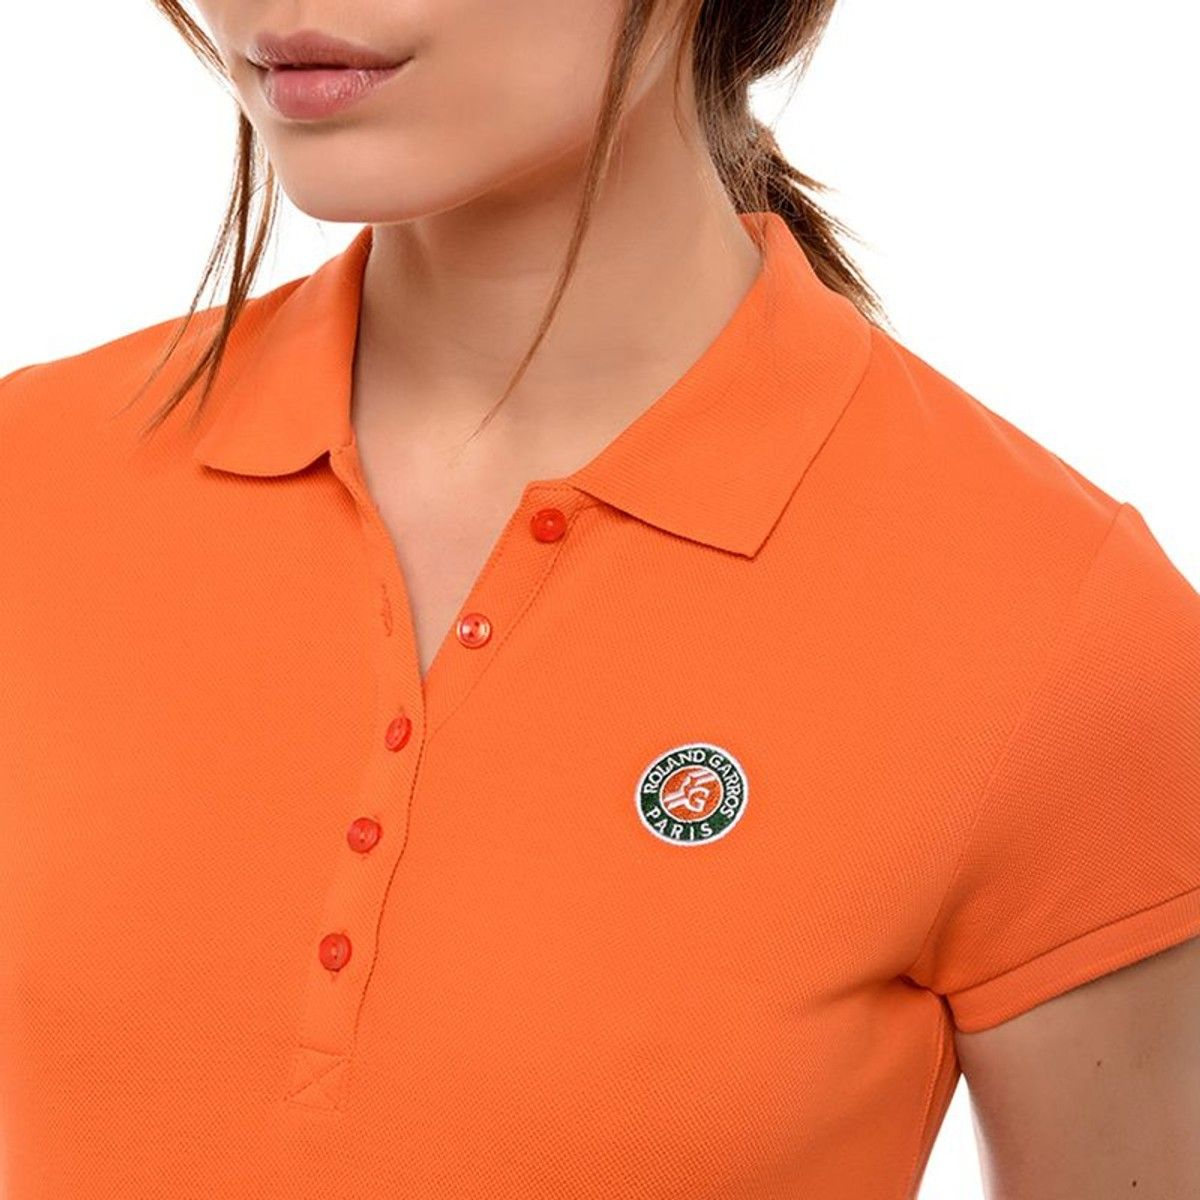 ee5a8554e2f1f Polo Piqué Logo Tricolore - Taille   42 38 46 32